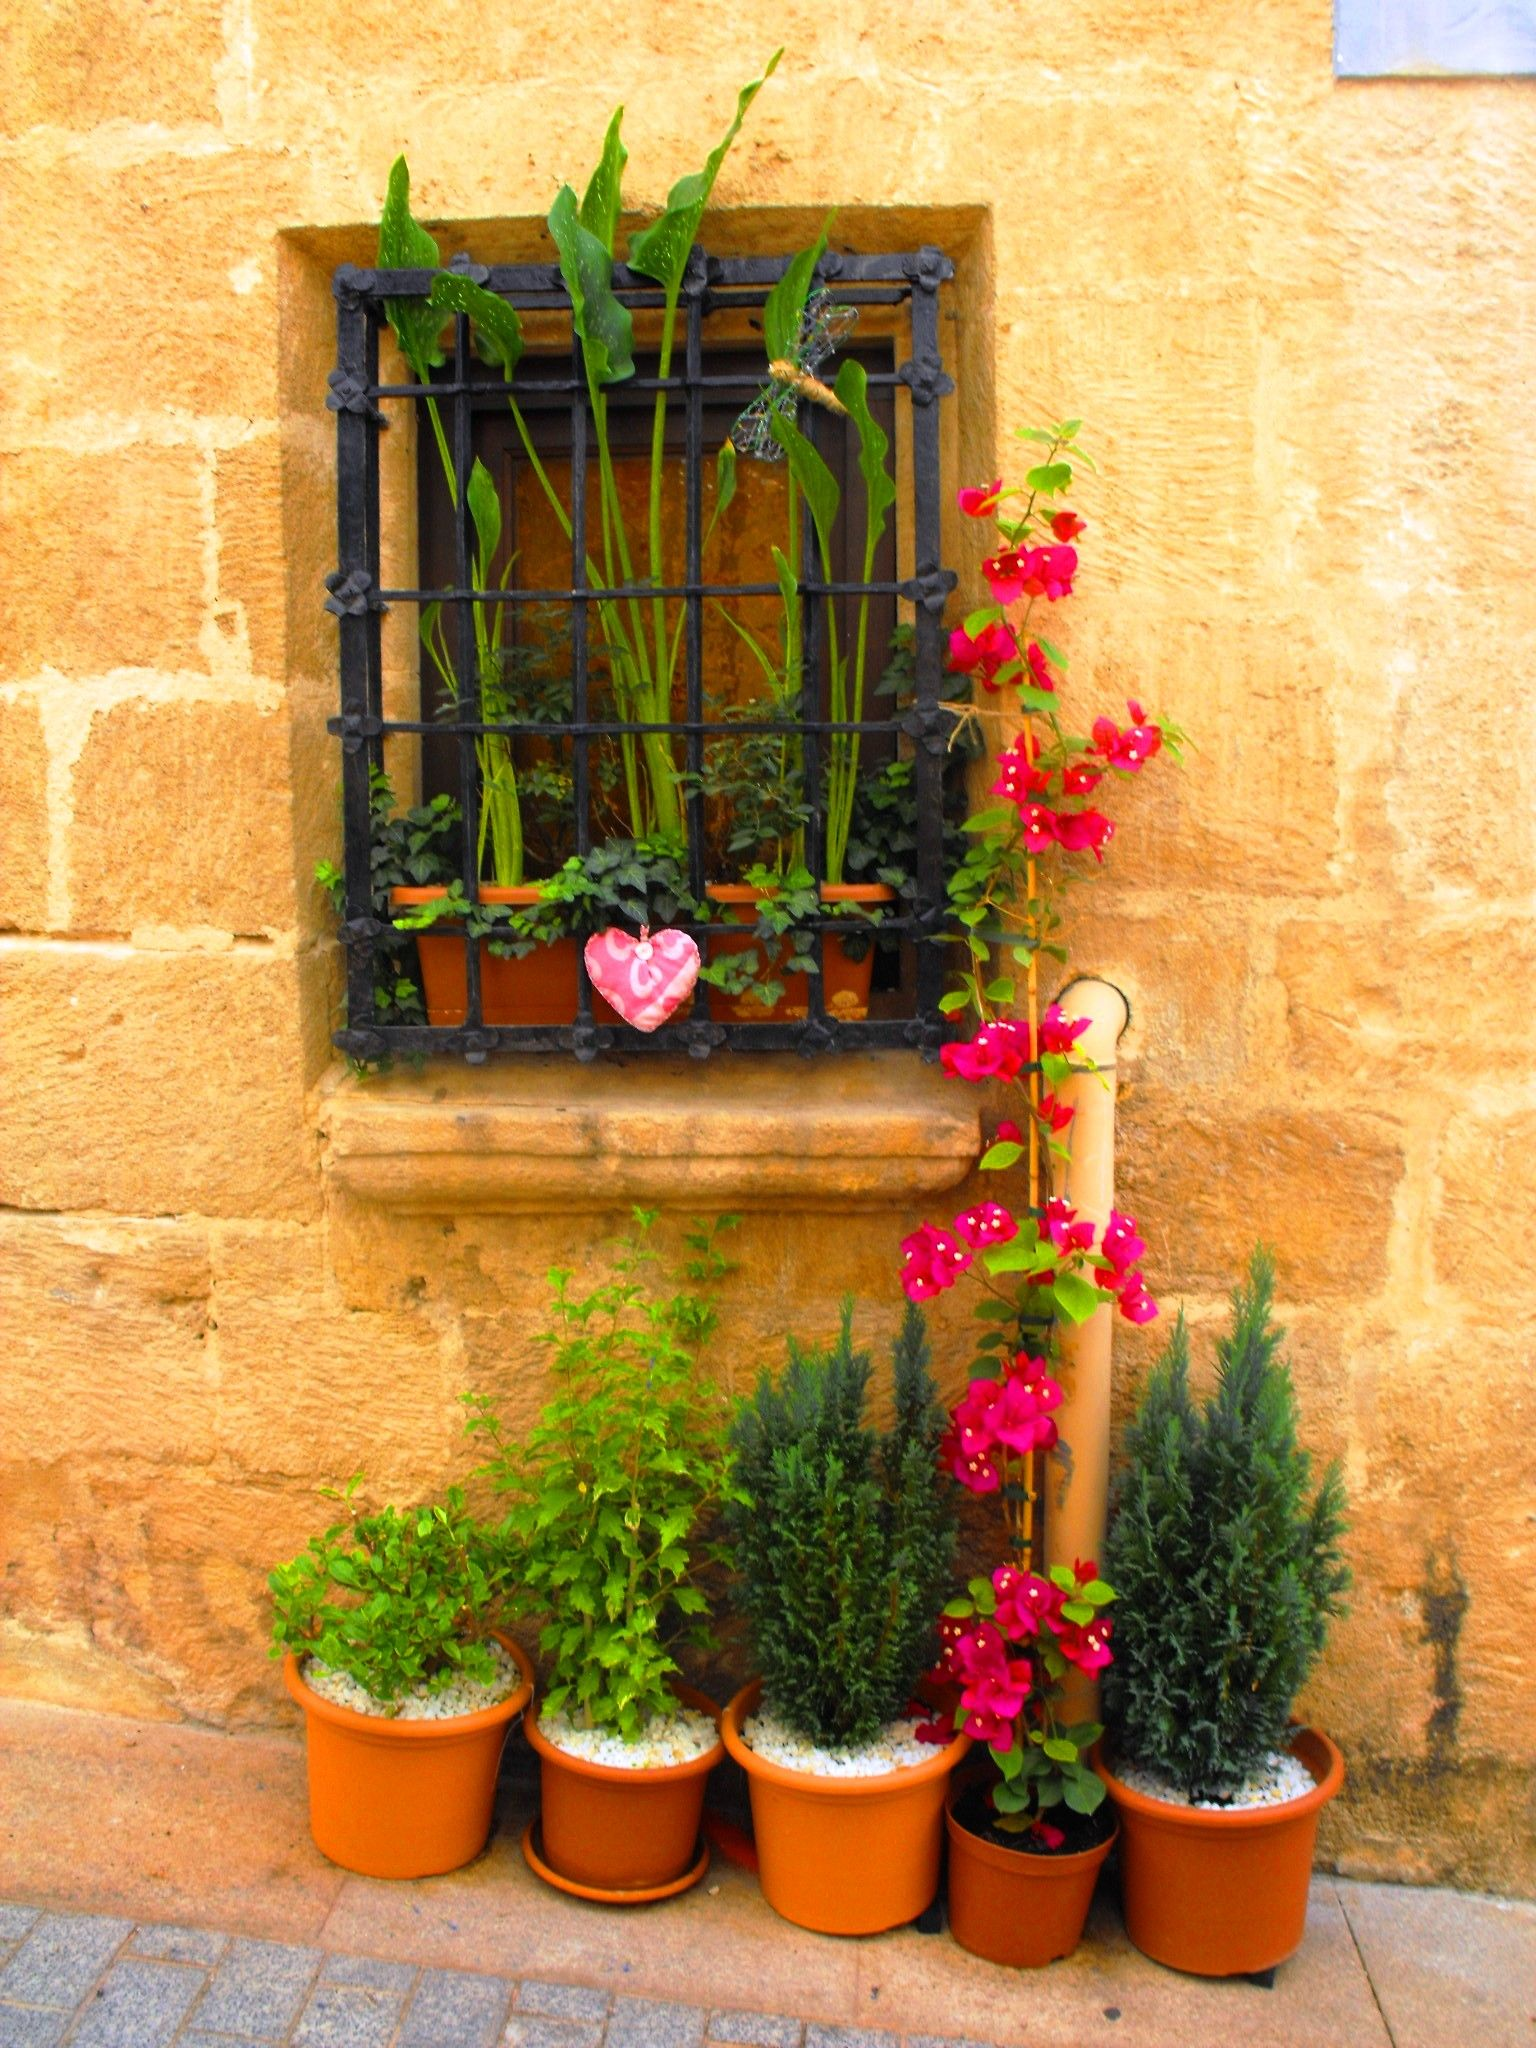 #xabia #javea #costablanca #xabiahistorica #turismo www.xabia.org